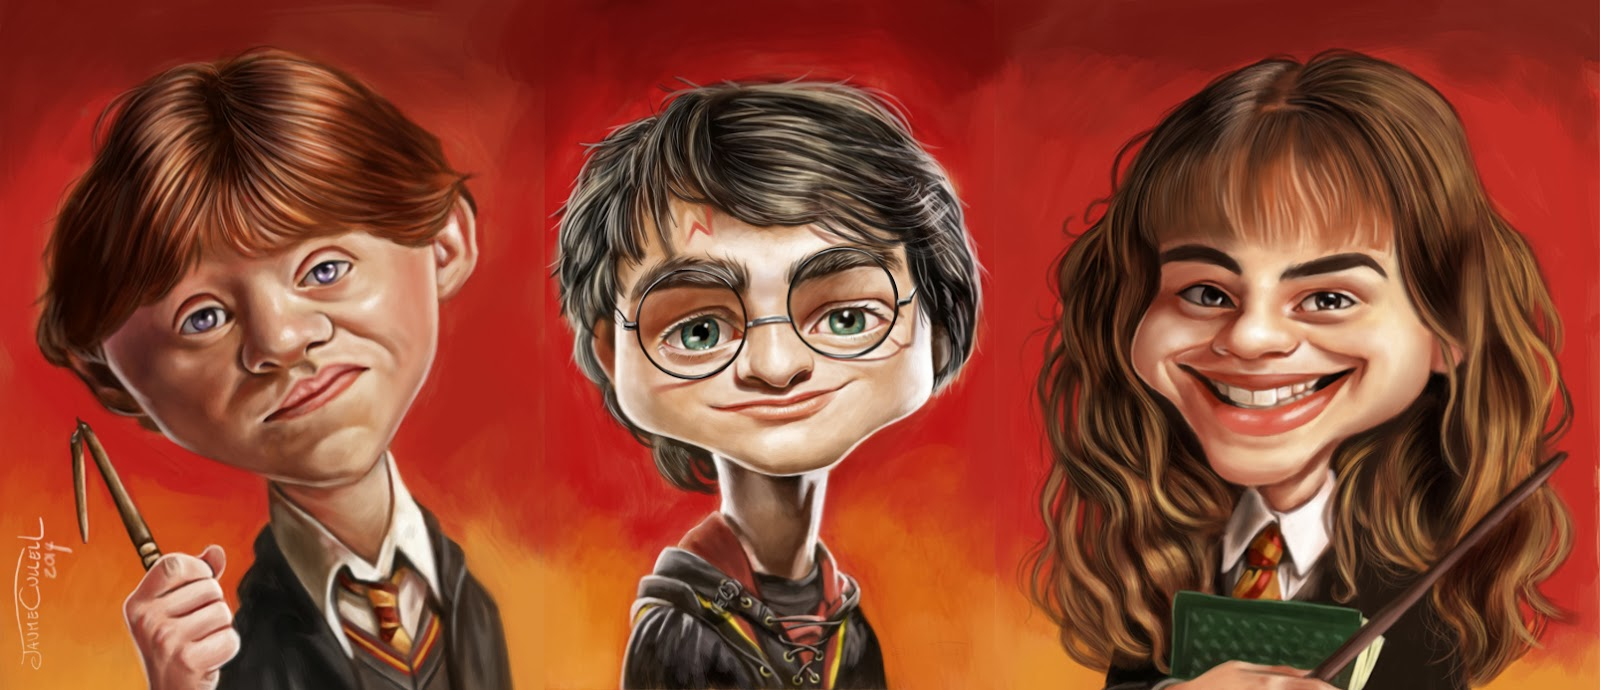 "Rupert Grint, Daniel Radcliffe y Emma Watson"" por Jaume Cullell"